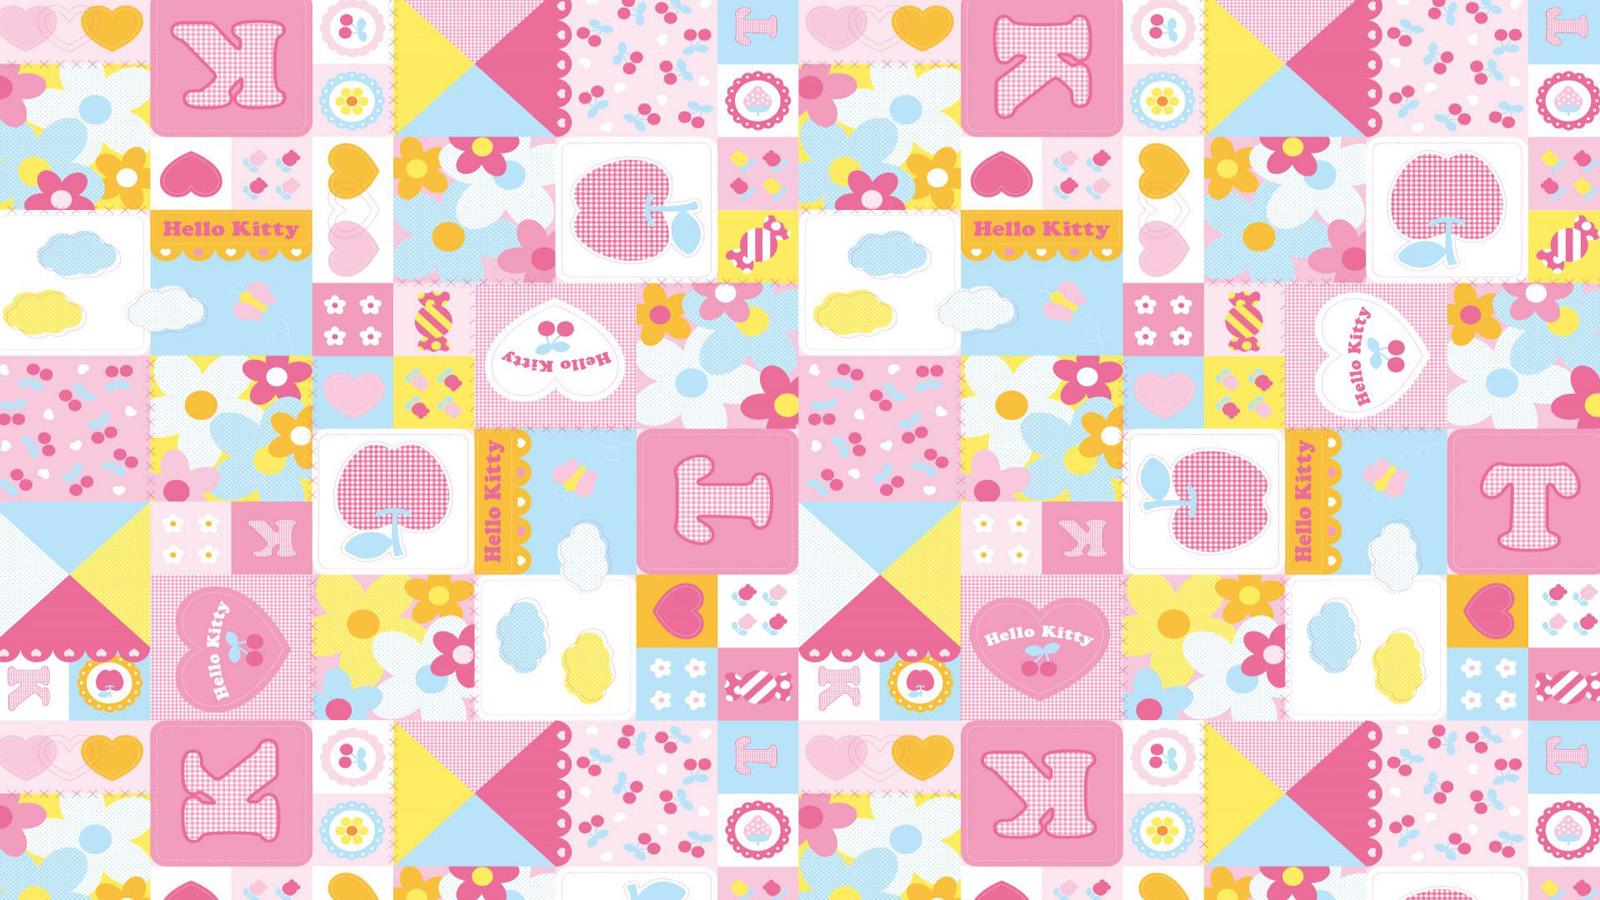 Hello Kitty Wallpapers 09, HD Wallpaper Downloads